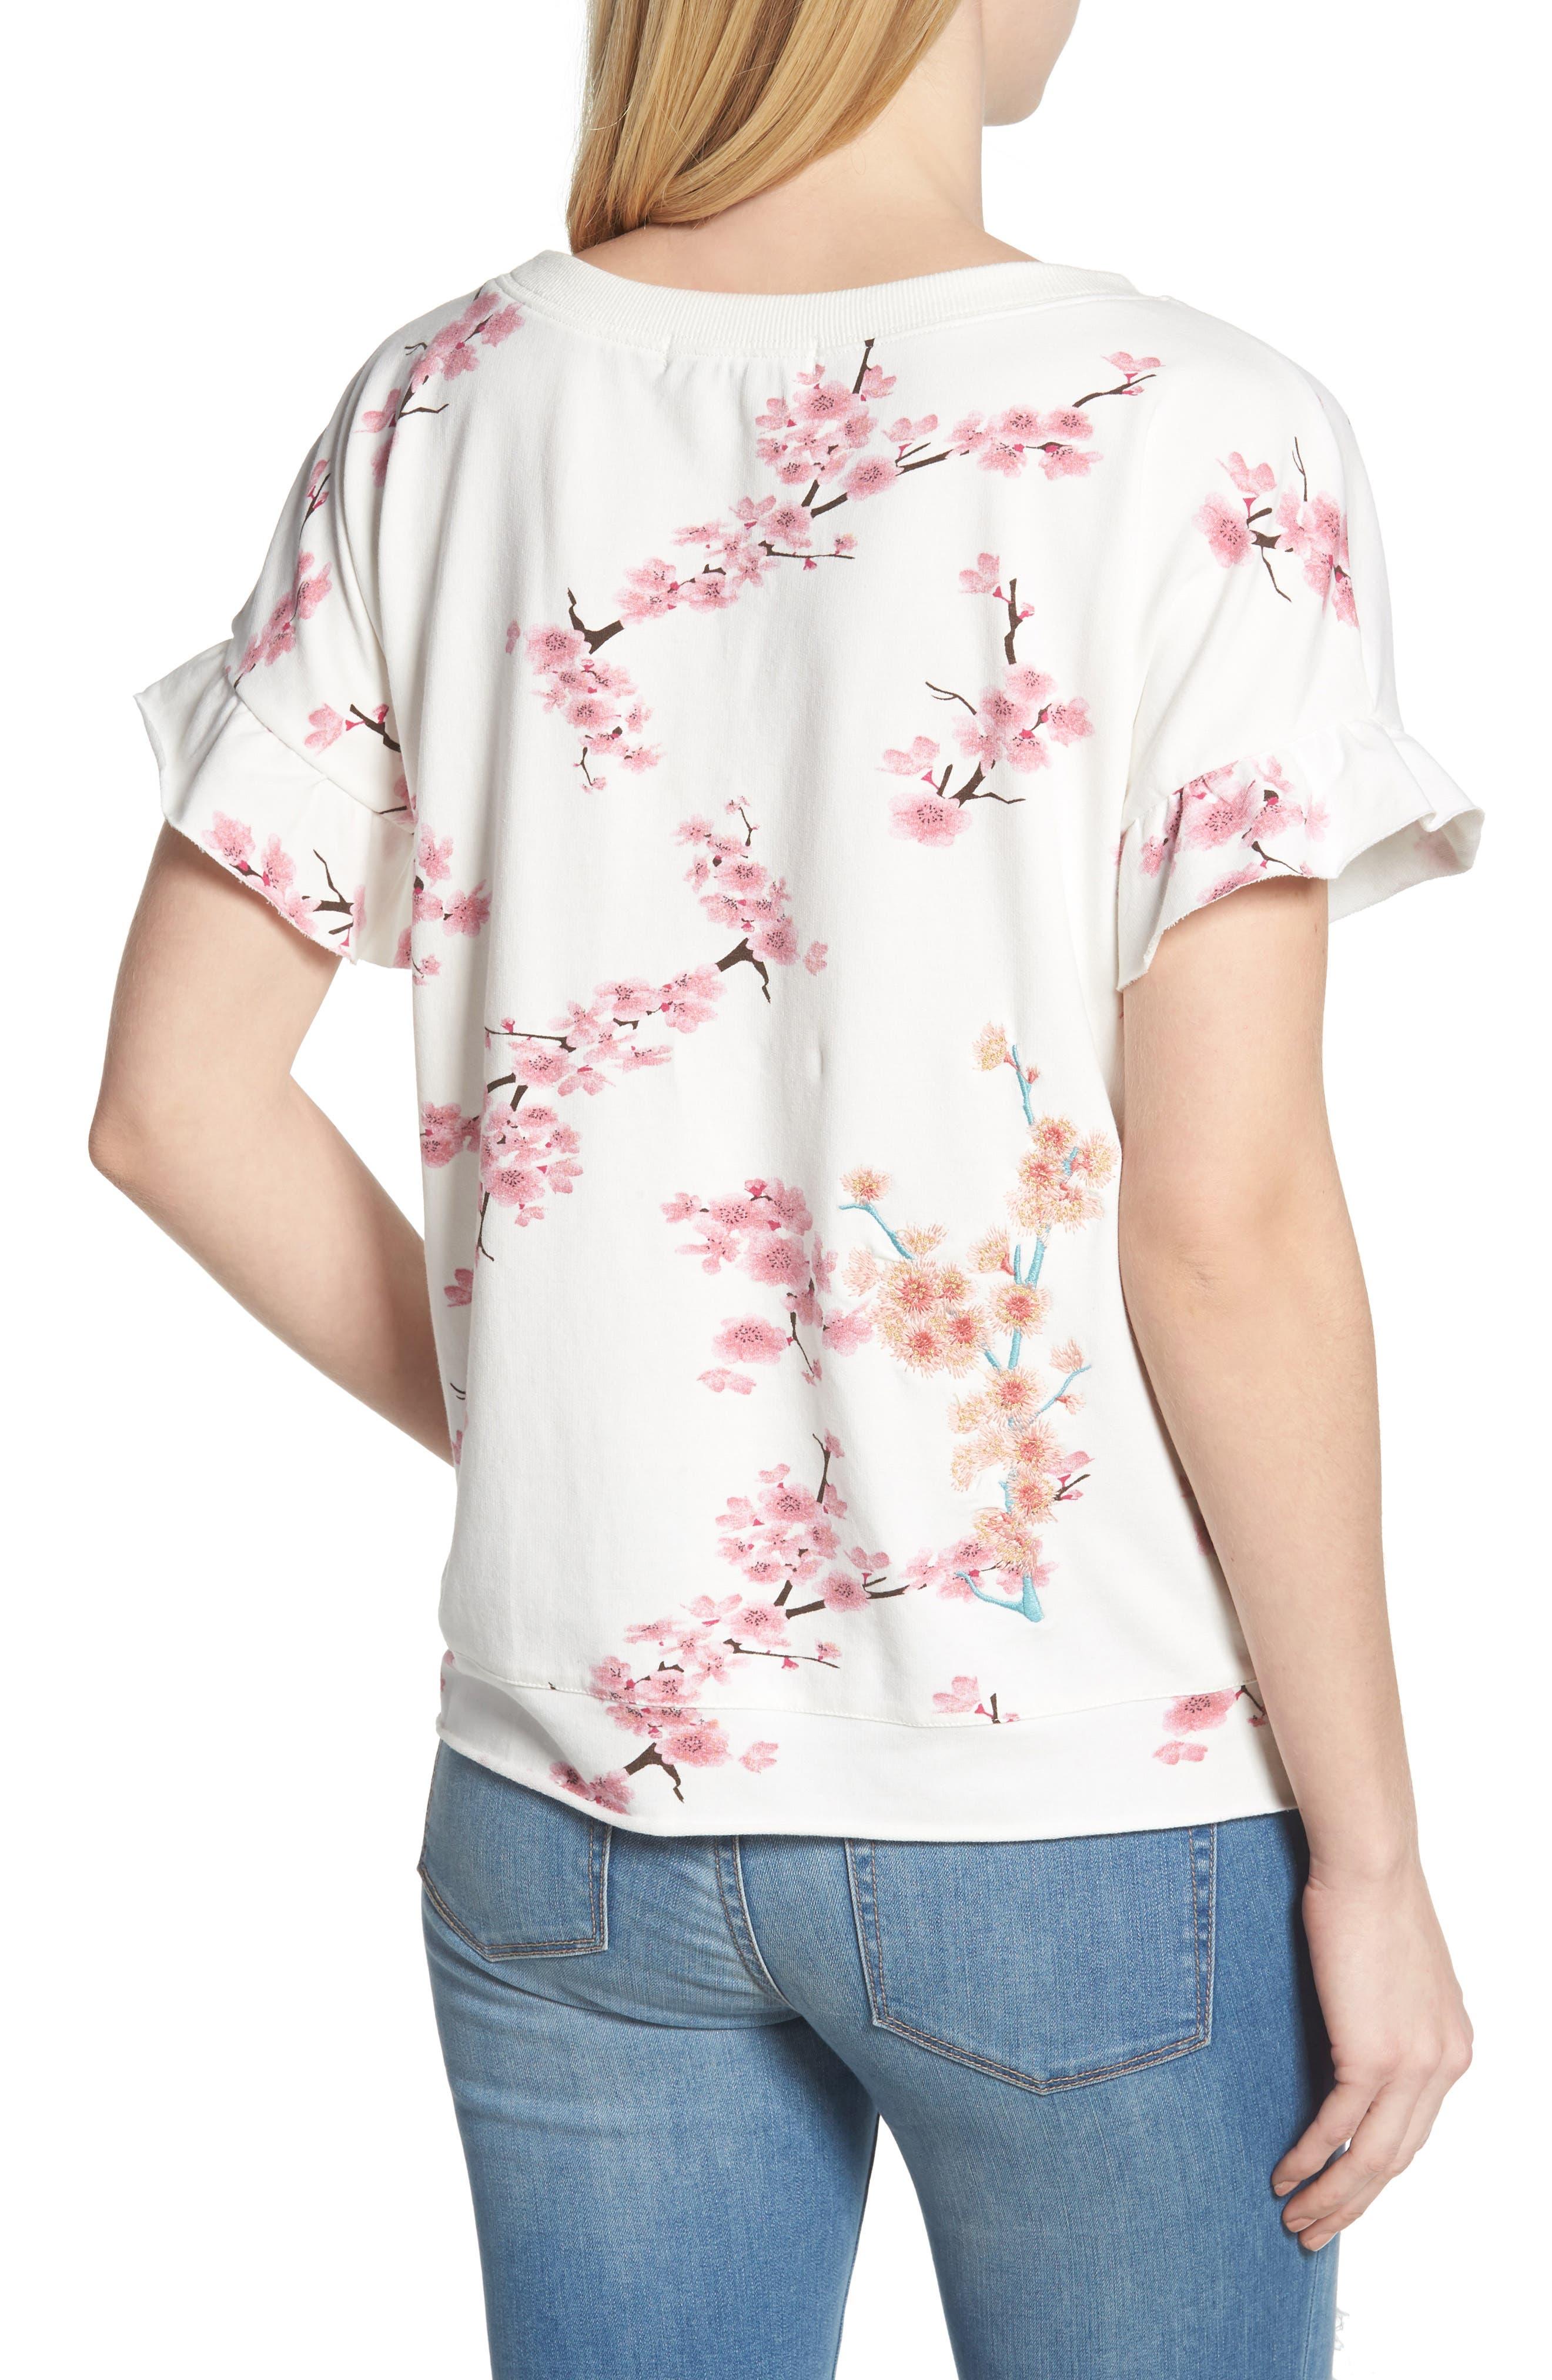 Cherry Blossom Short Sleeve Lace-Up Sweatshirt,                             Alternate thumbnail 2, color,                             WHITE CHERRY BLOSSOM